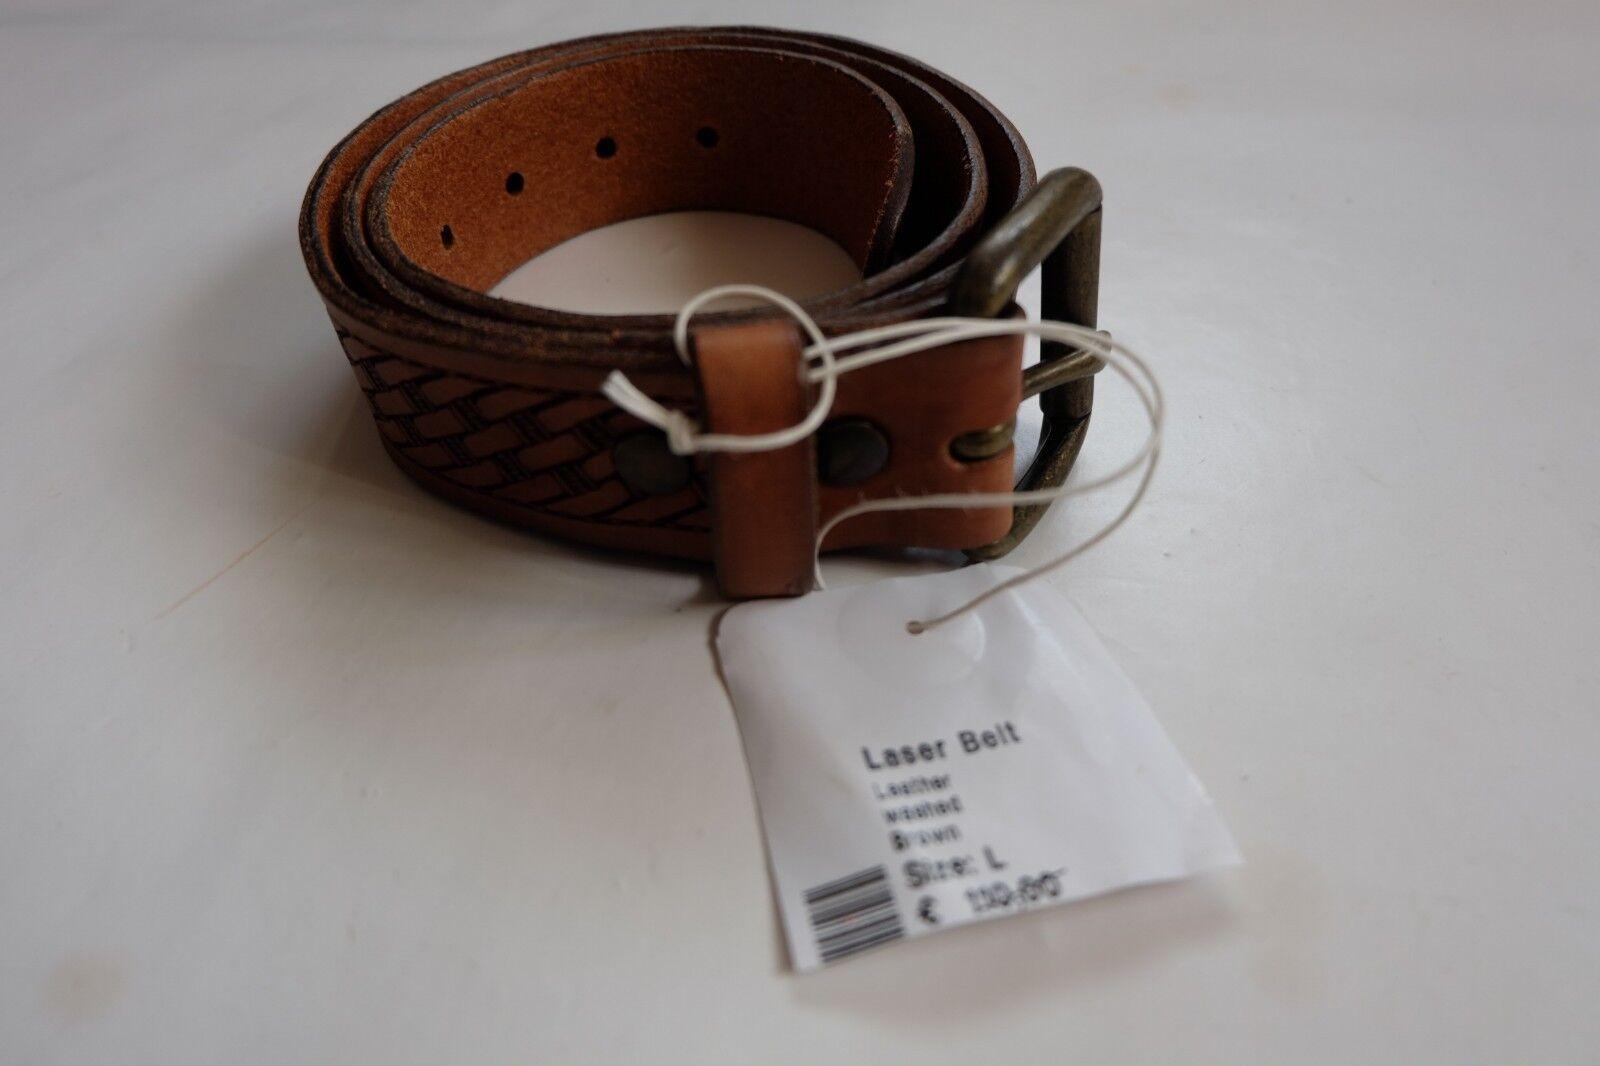 834dc8be8f9b Ceinture Edwin Laser Belt Leather Washed Brown Taille L 95cm   eBay